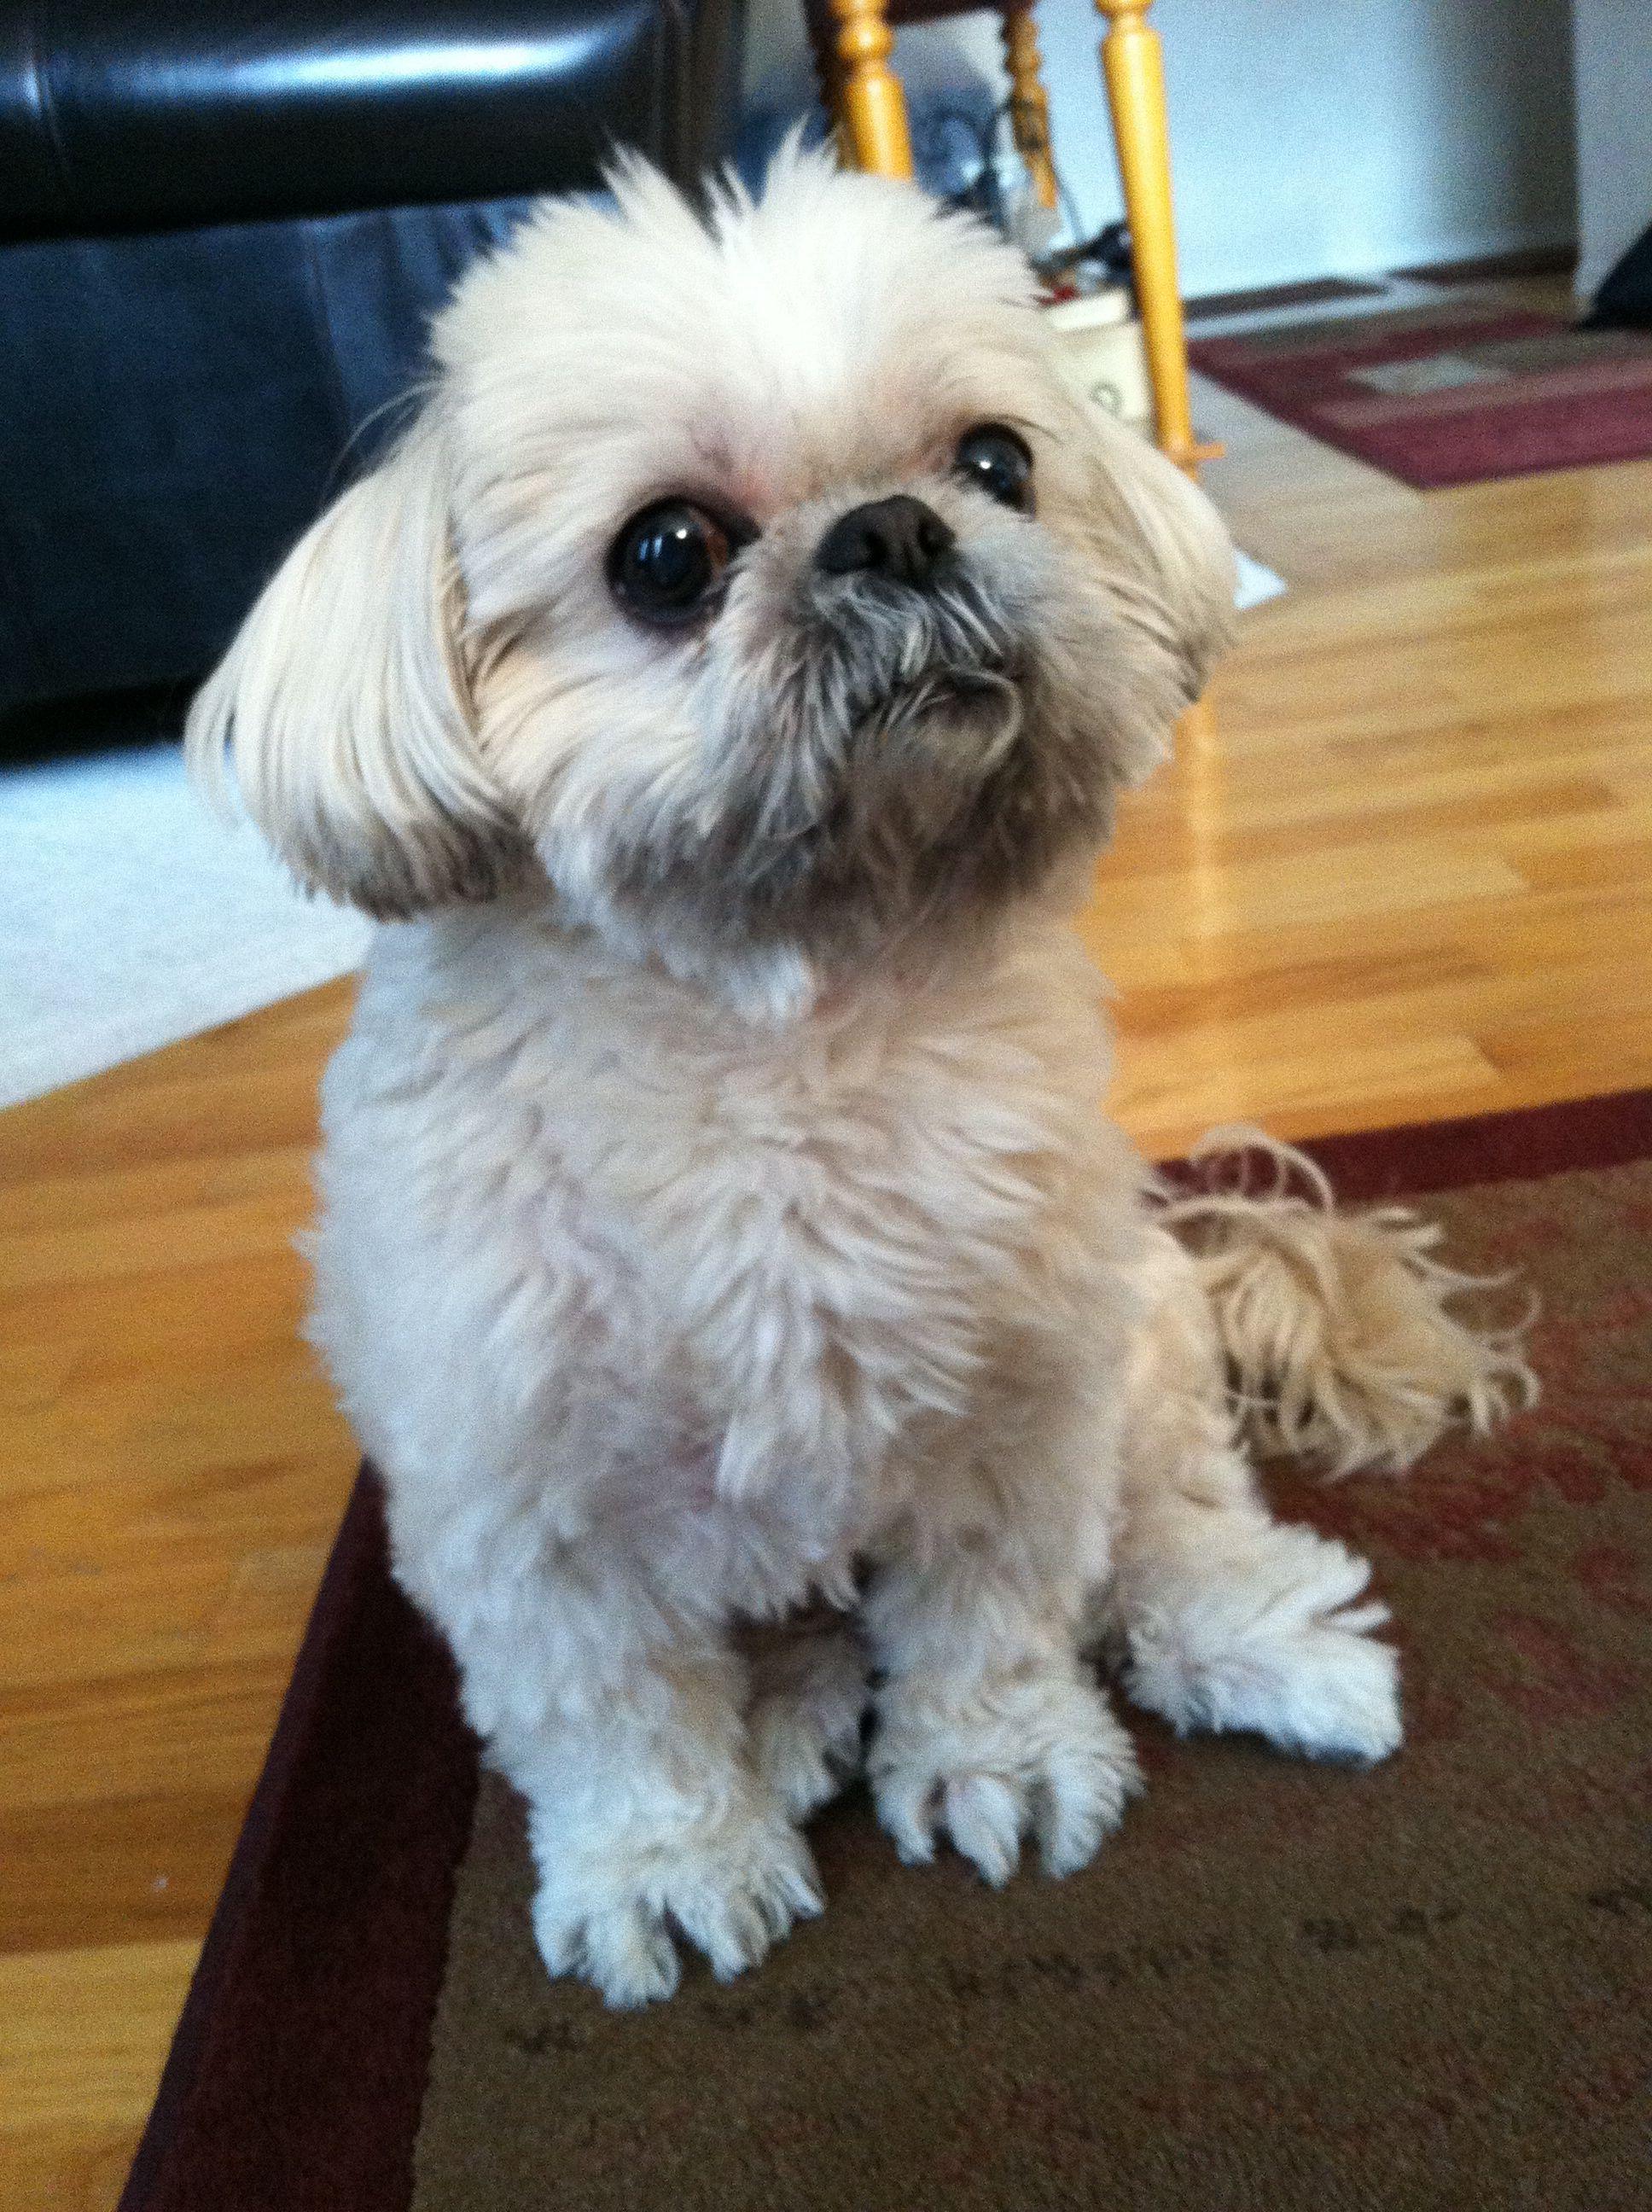 My Shihtzu Lucy Shih Tzu Shih Tzu Puppy Shih Tzu Dog